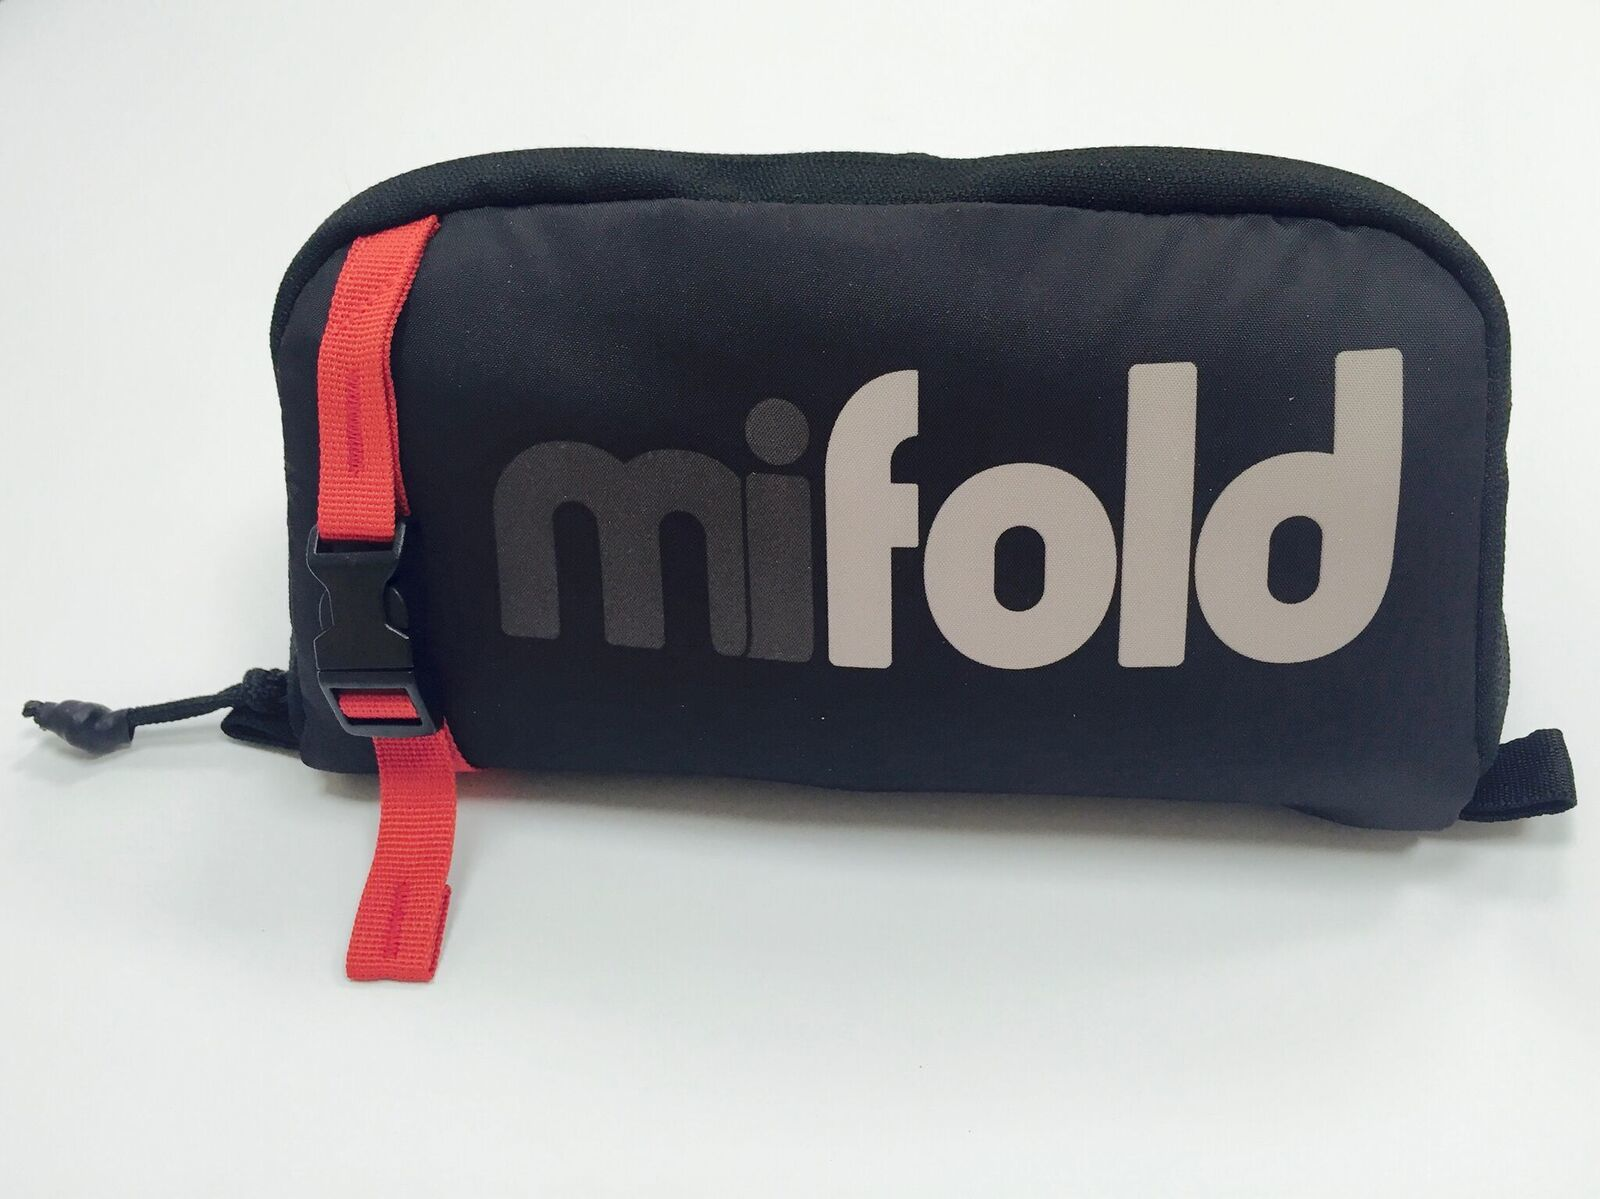 Чехол на бустер автомобильный Mifold